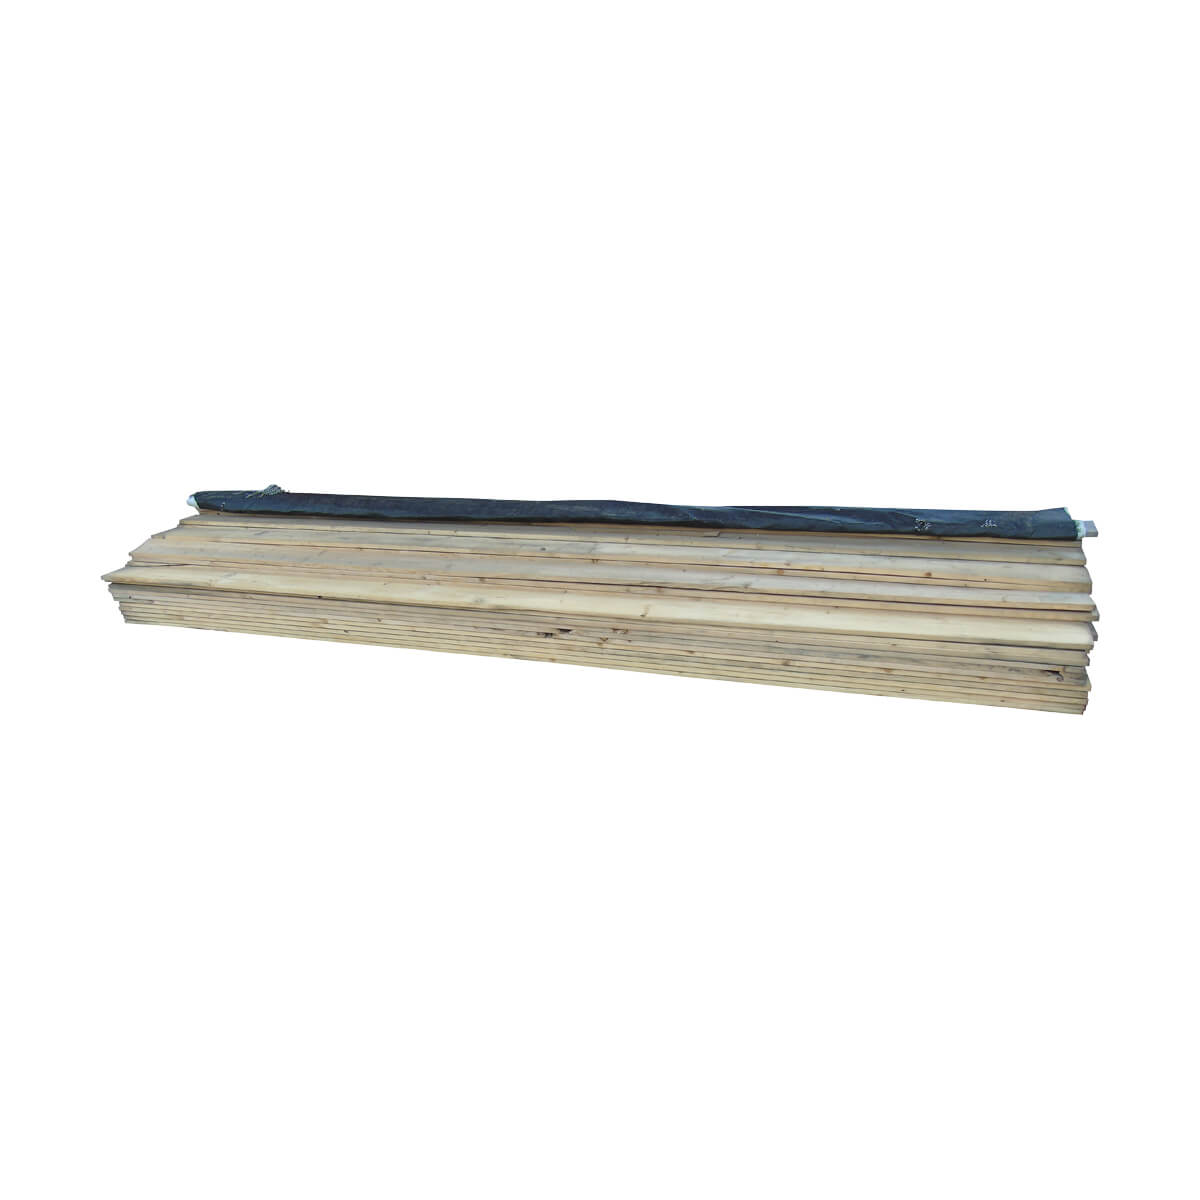 #3 Spruce Lumber - SPR #3 -  1 x 6 x 12-ft